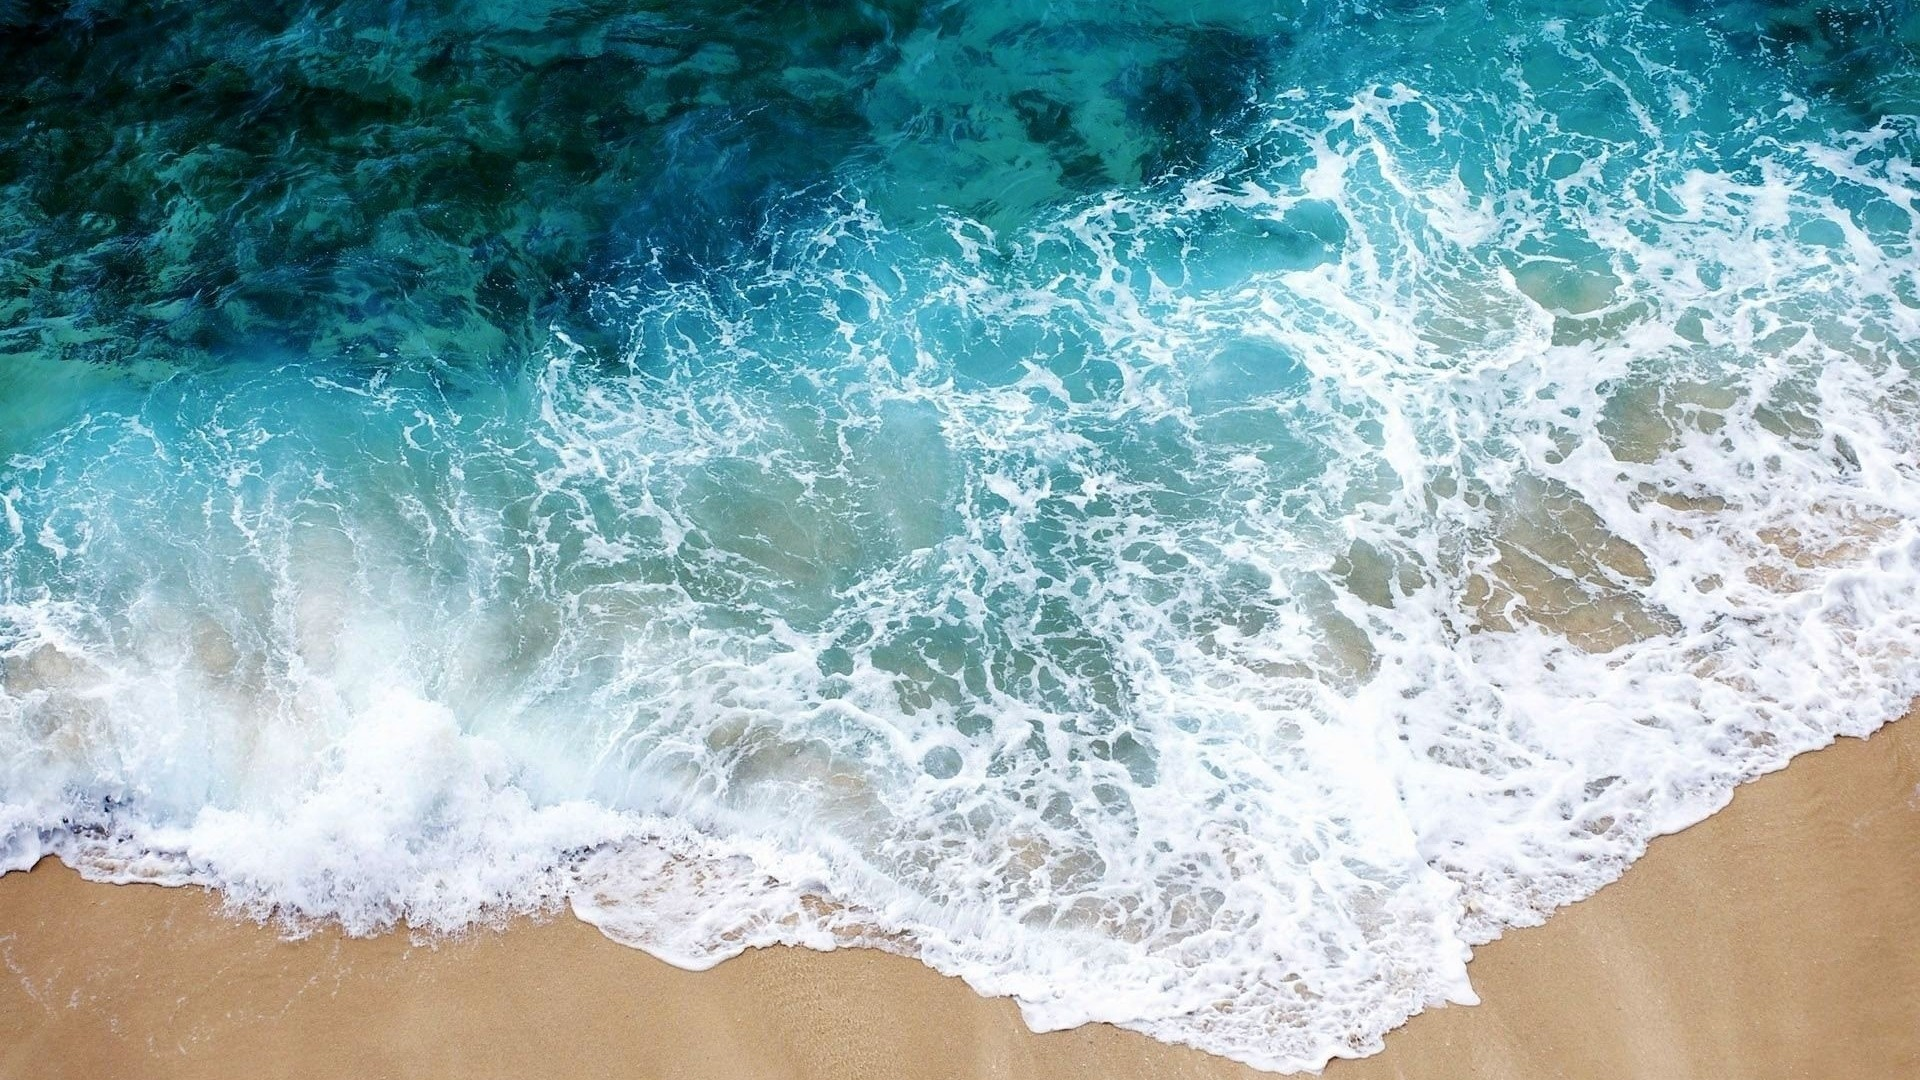 Wallpaper beach, sea, sand, water, transparent, purity, freshness,